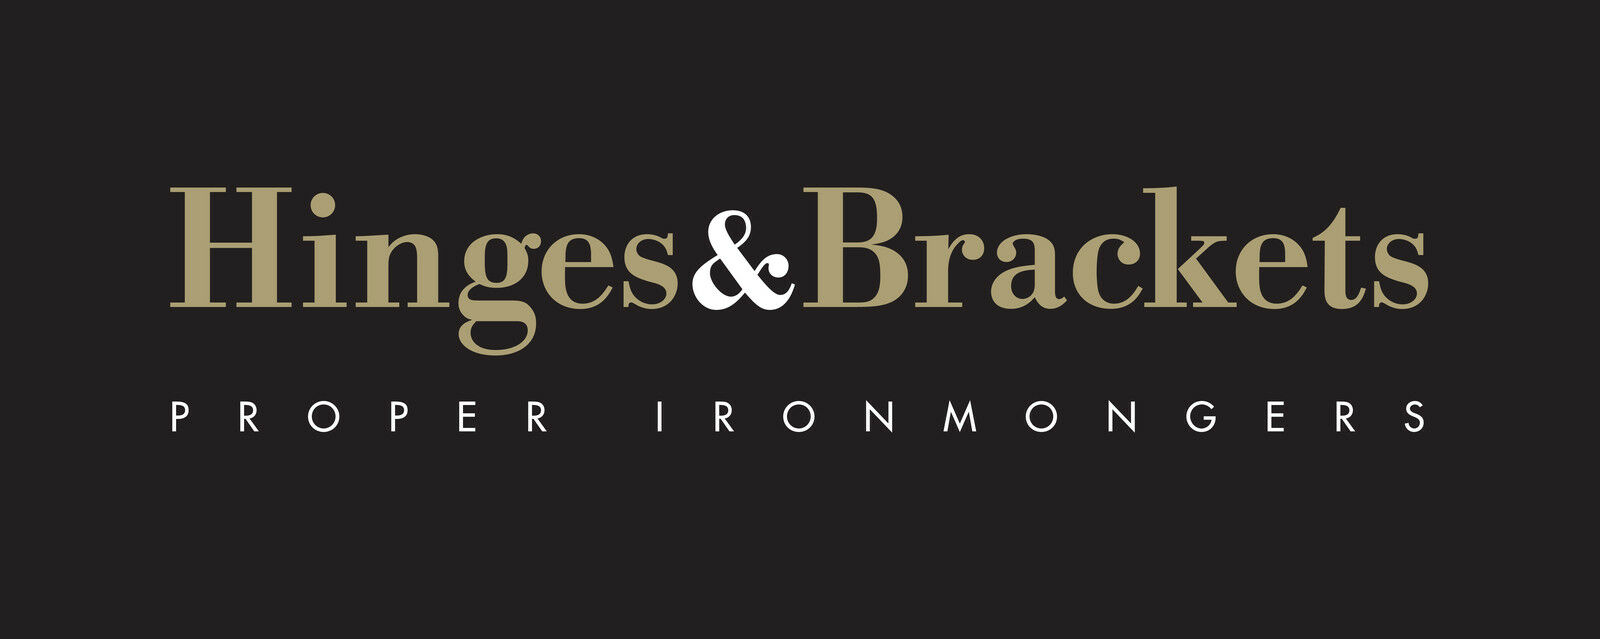 Hinges & Brackets